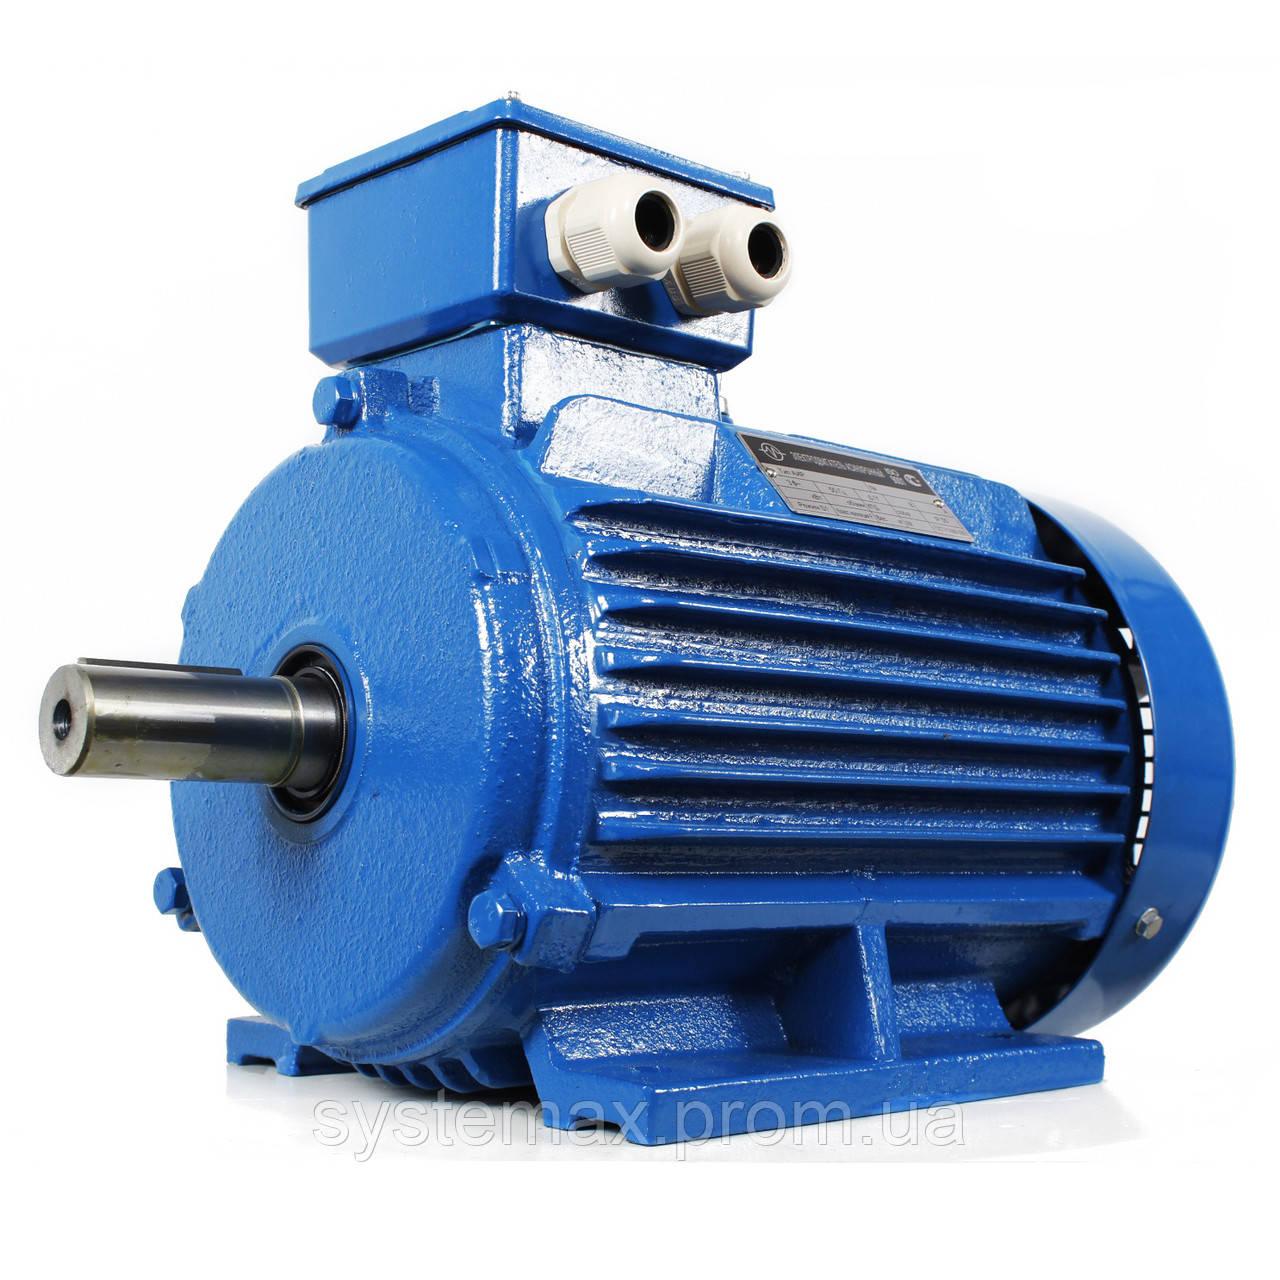 Электродвигатель АИР90LВ8 (АИР 90 LВ8) 1,1 кВт 750 об/мин